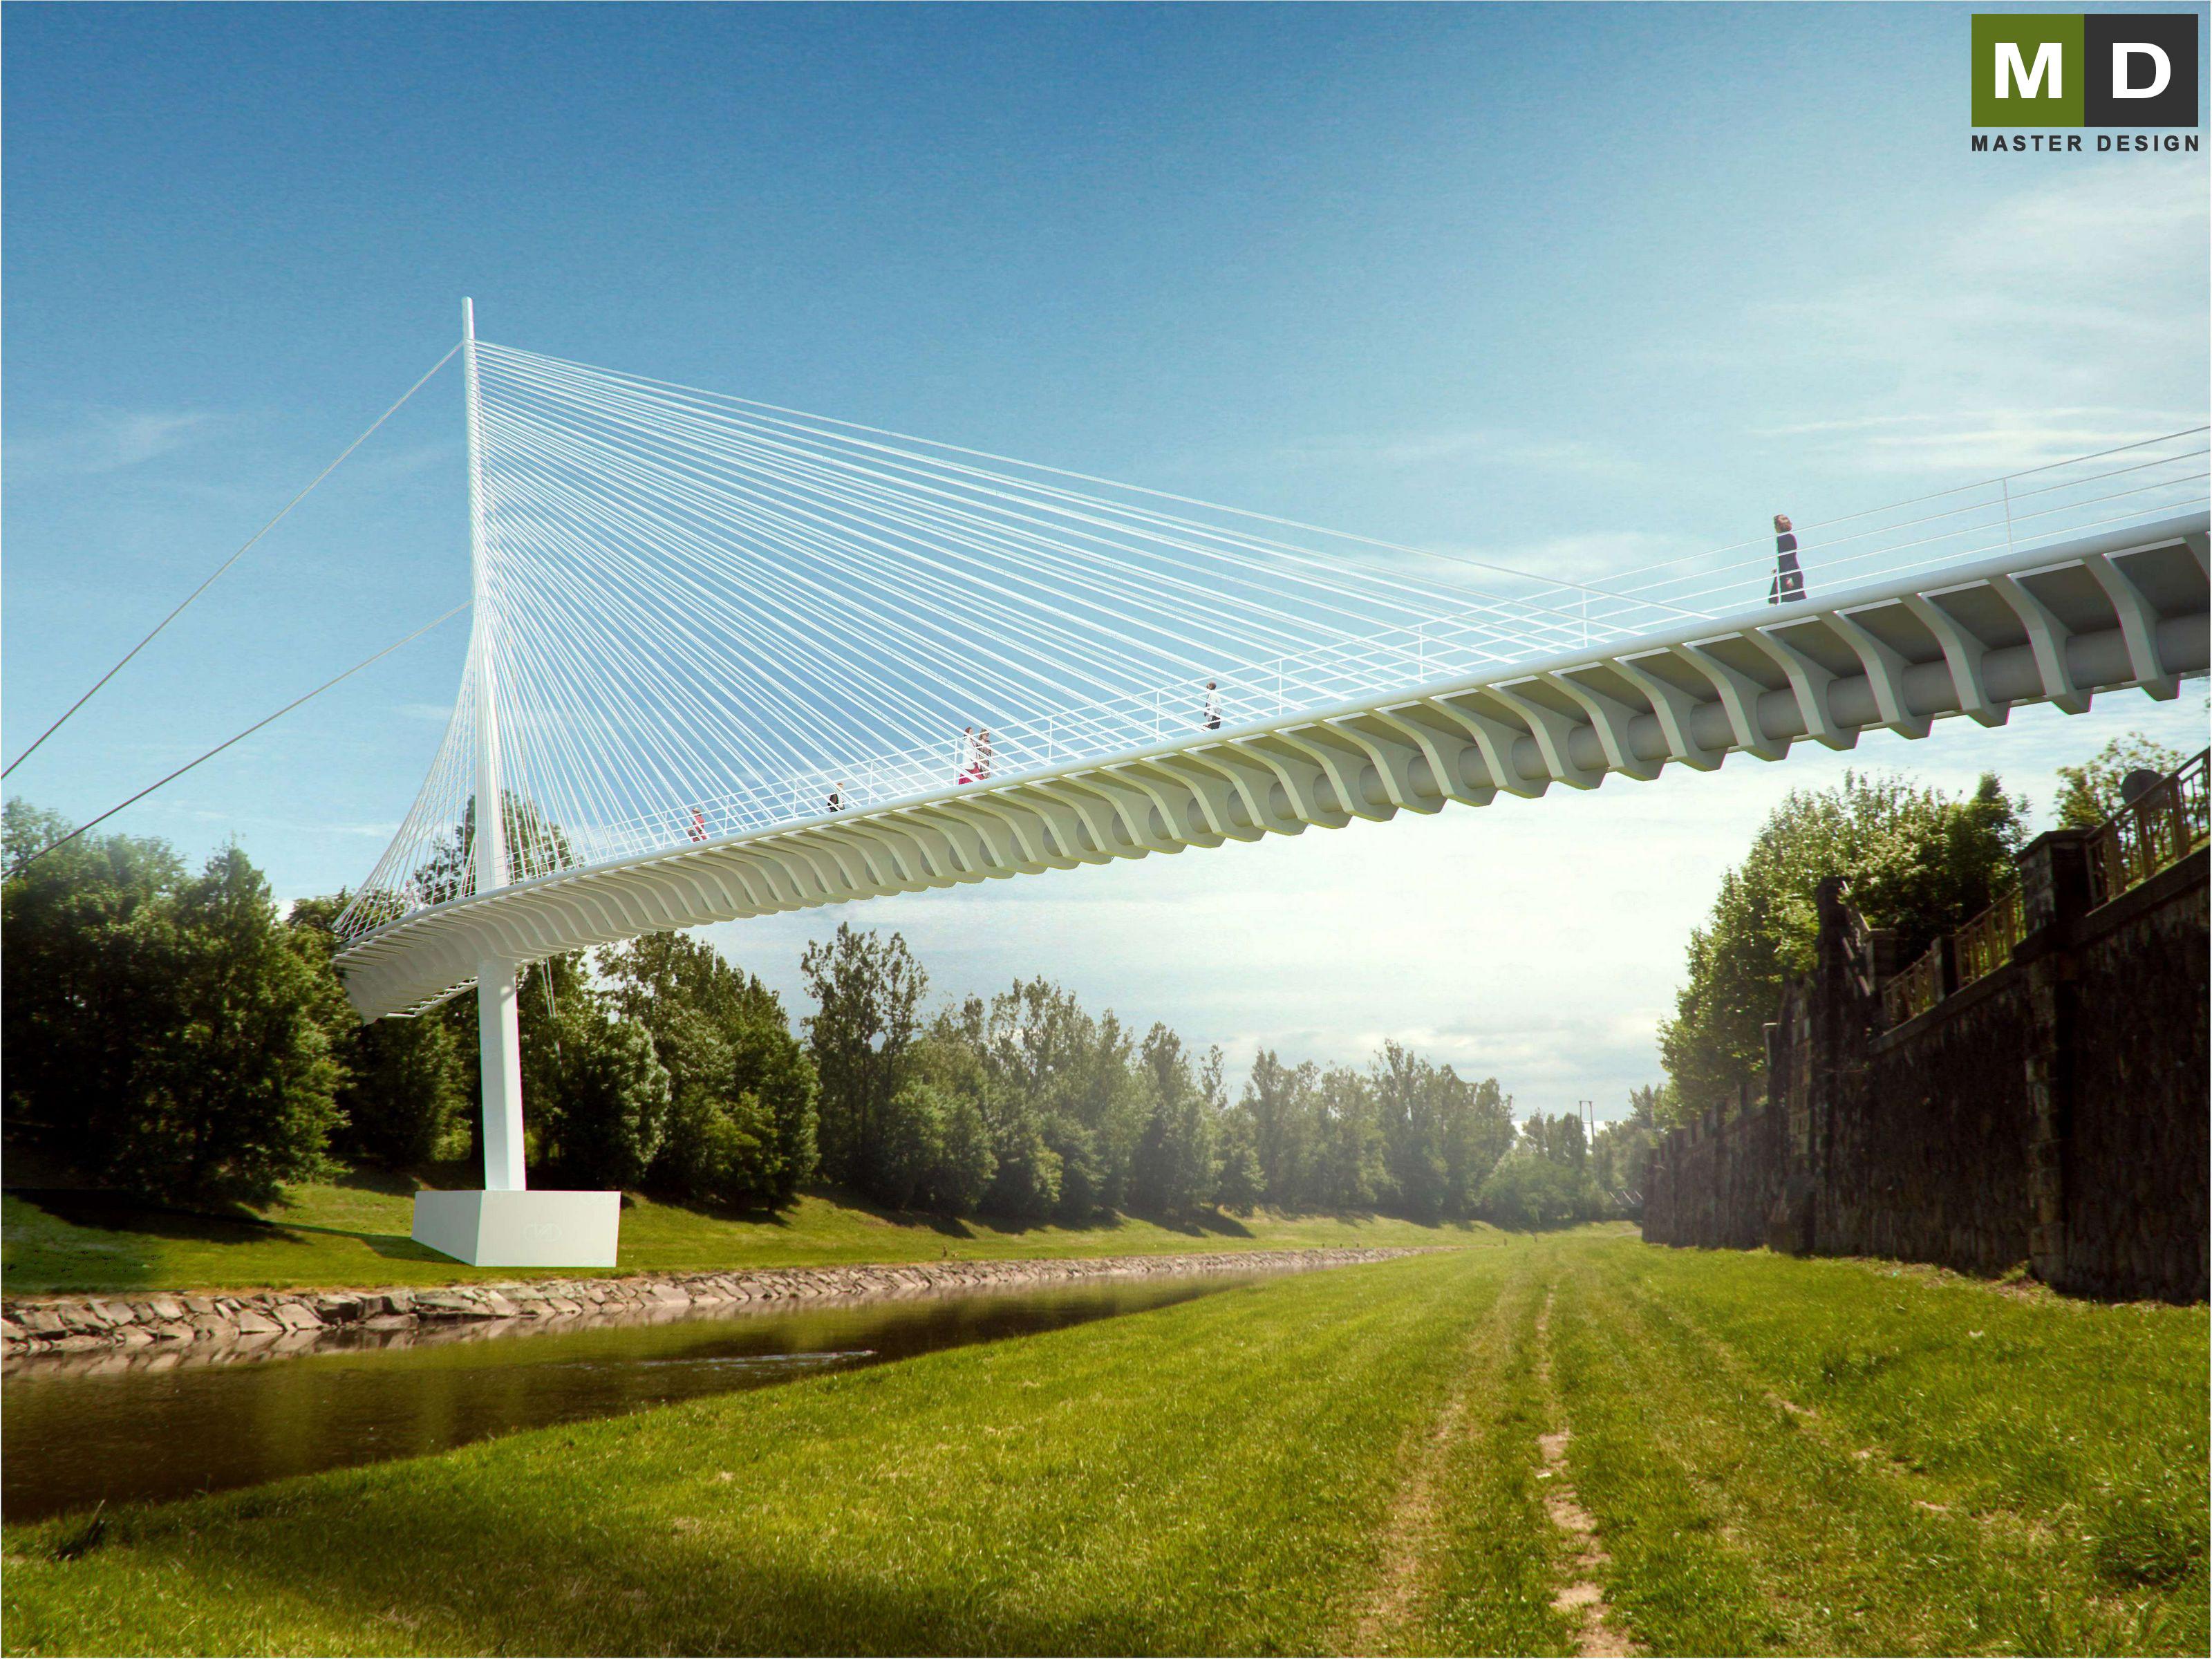 Pedestrian footbridge over the river - Ostrava | MASTER